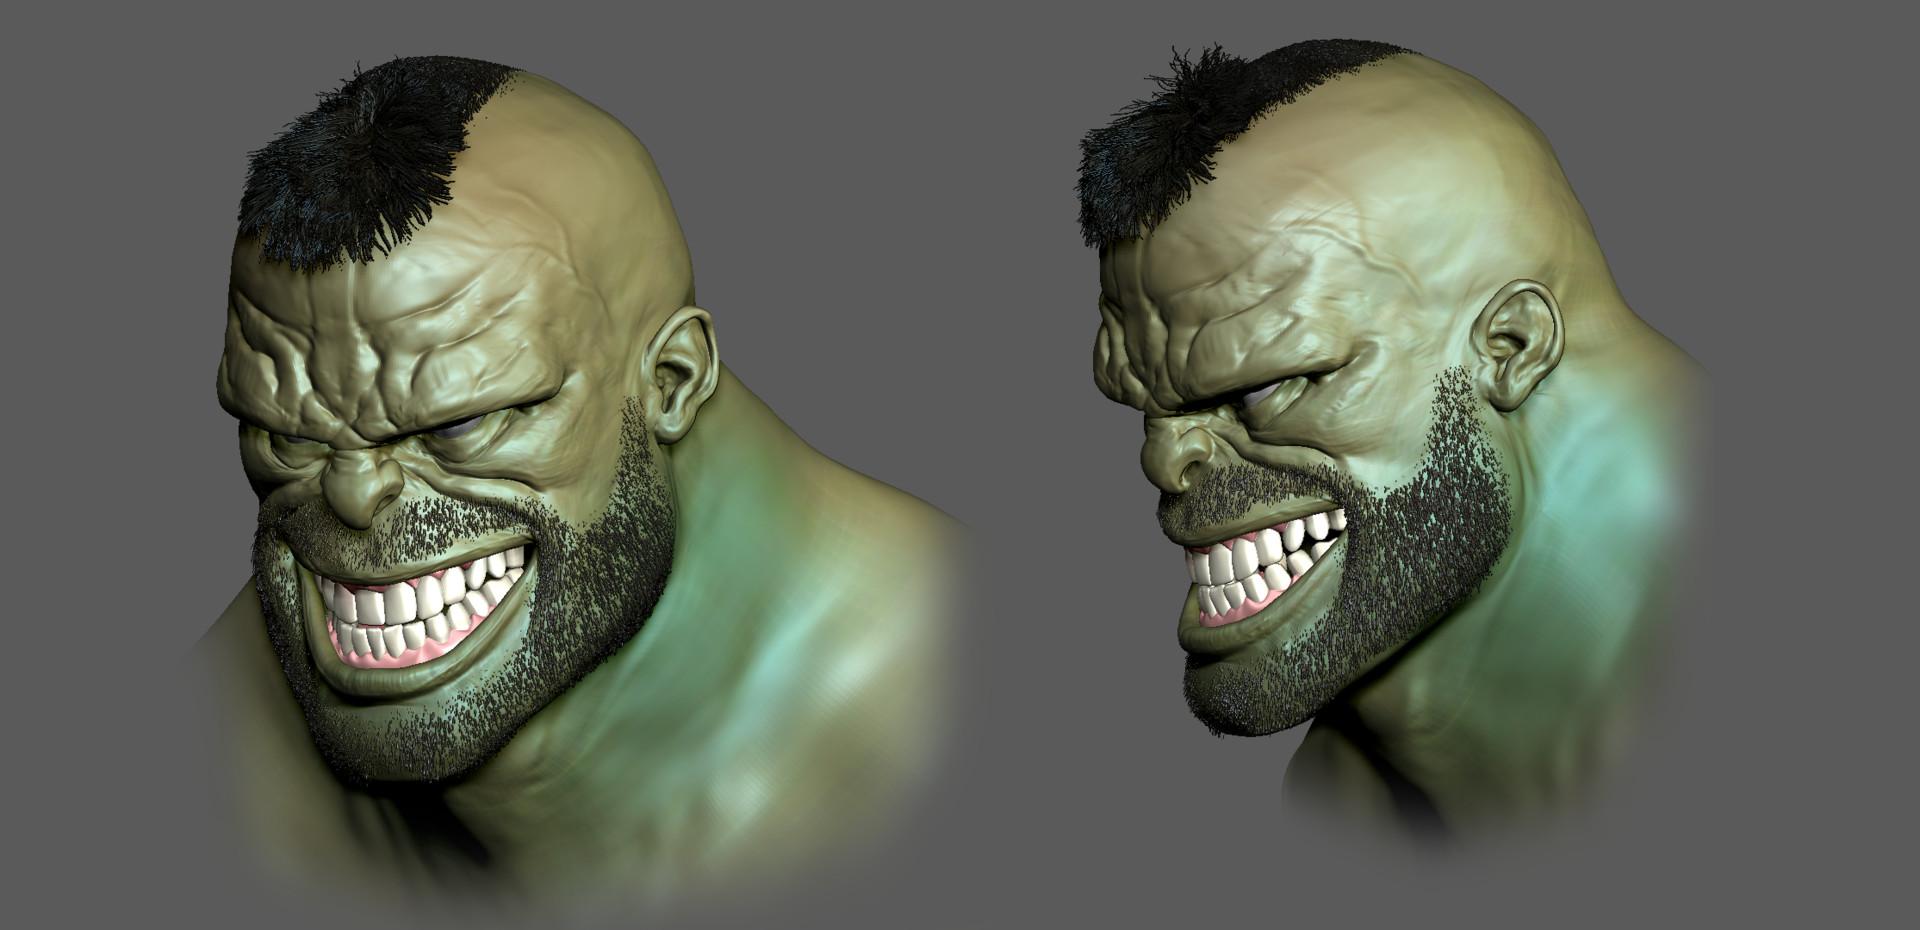 Pierre benjamin hulk test render0266666666